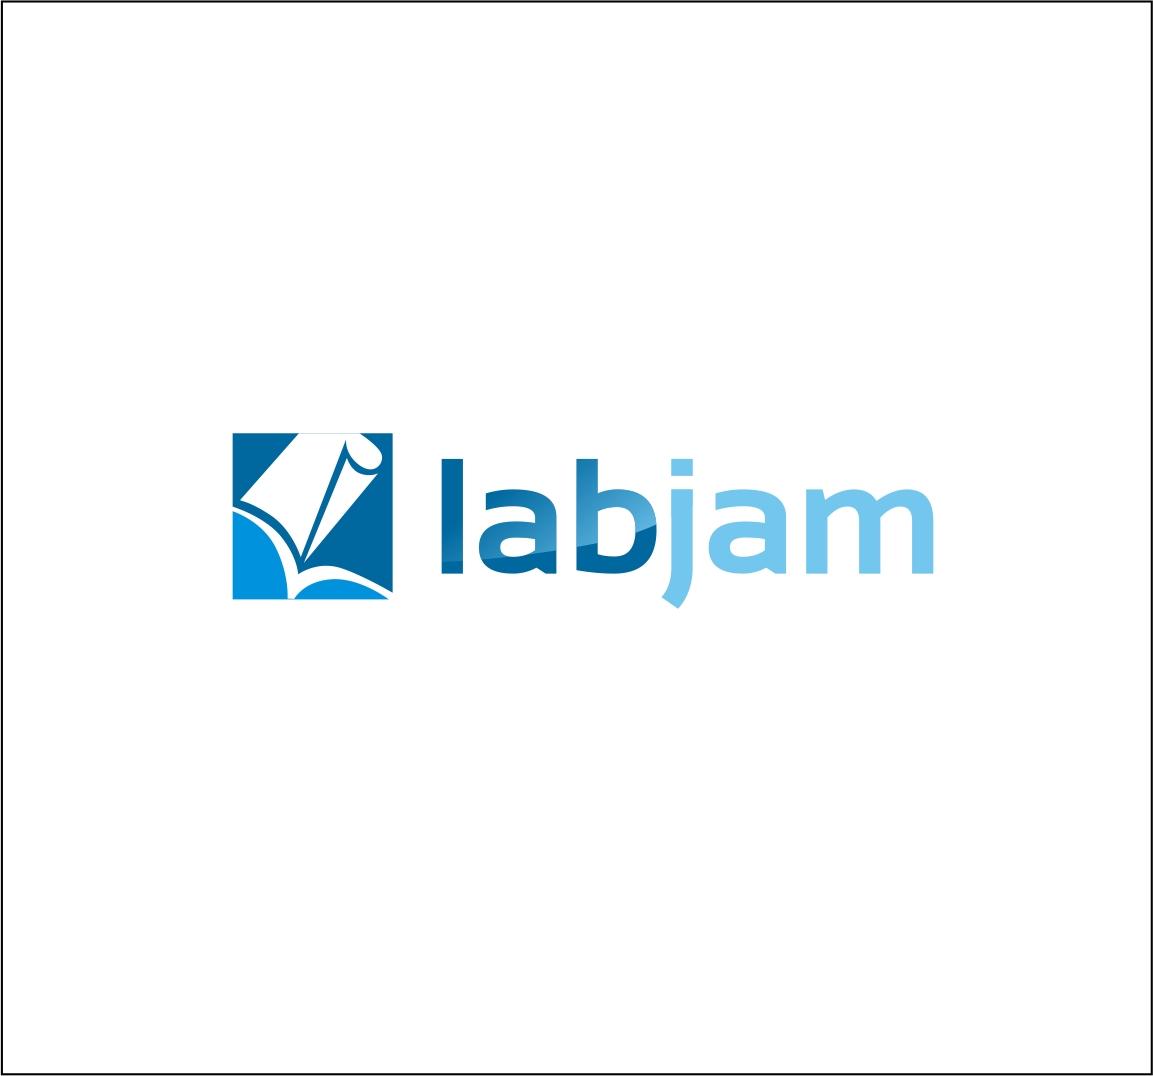 Logo Design by arkvisdesigns - Entry No. 97 in the Logo Design Contest Labjam.